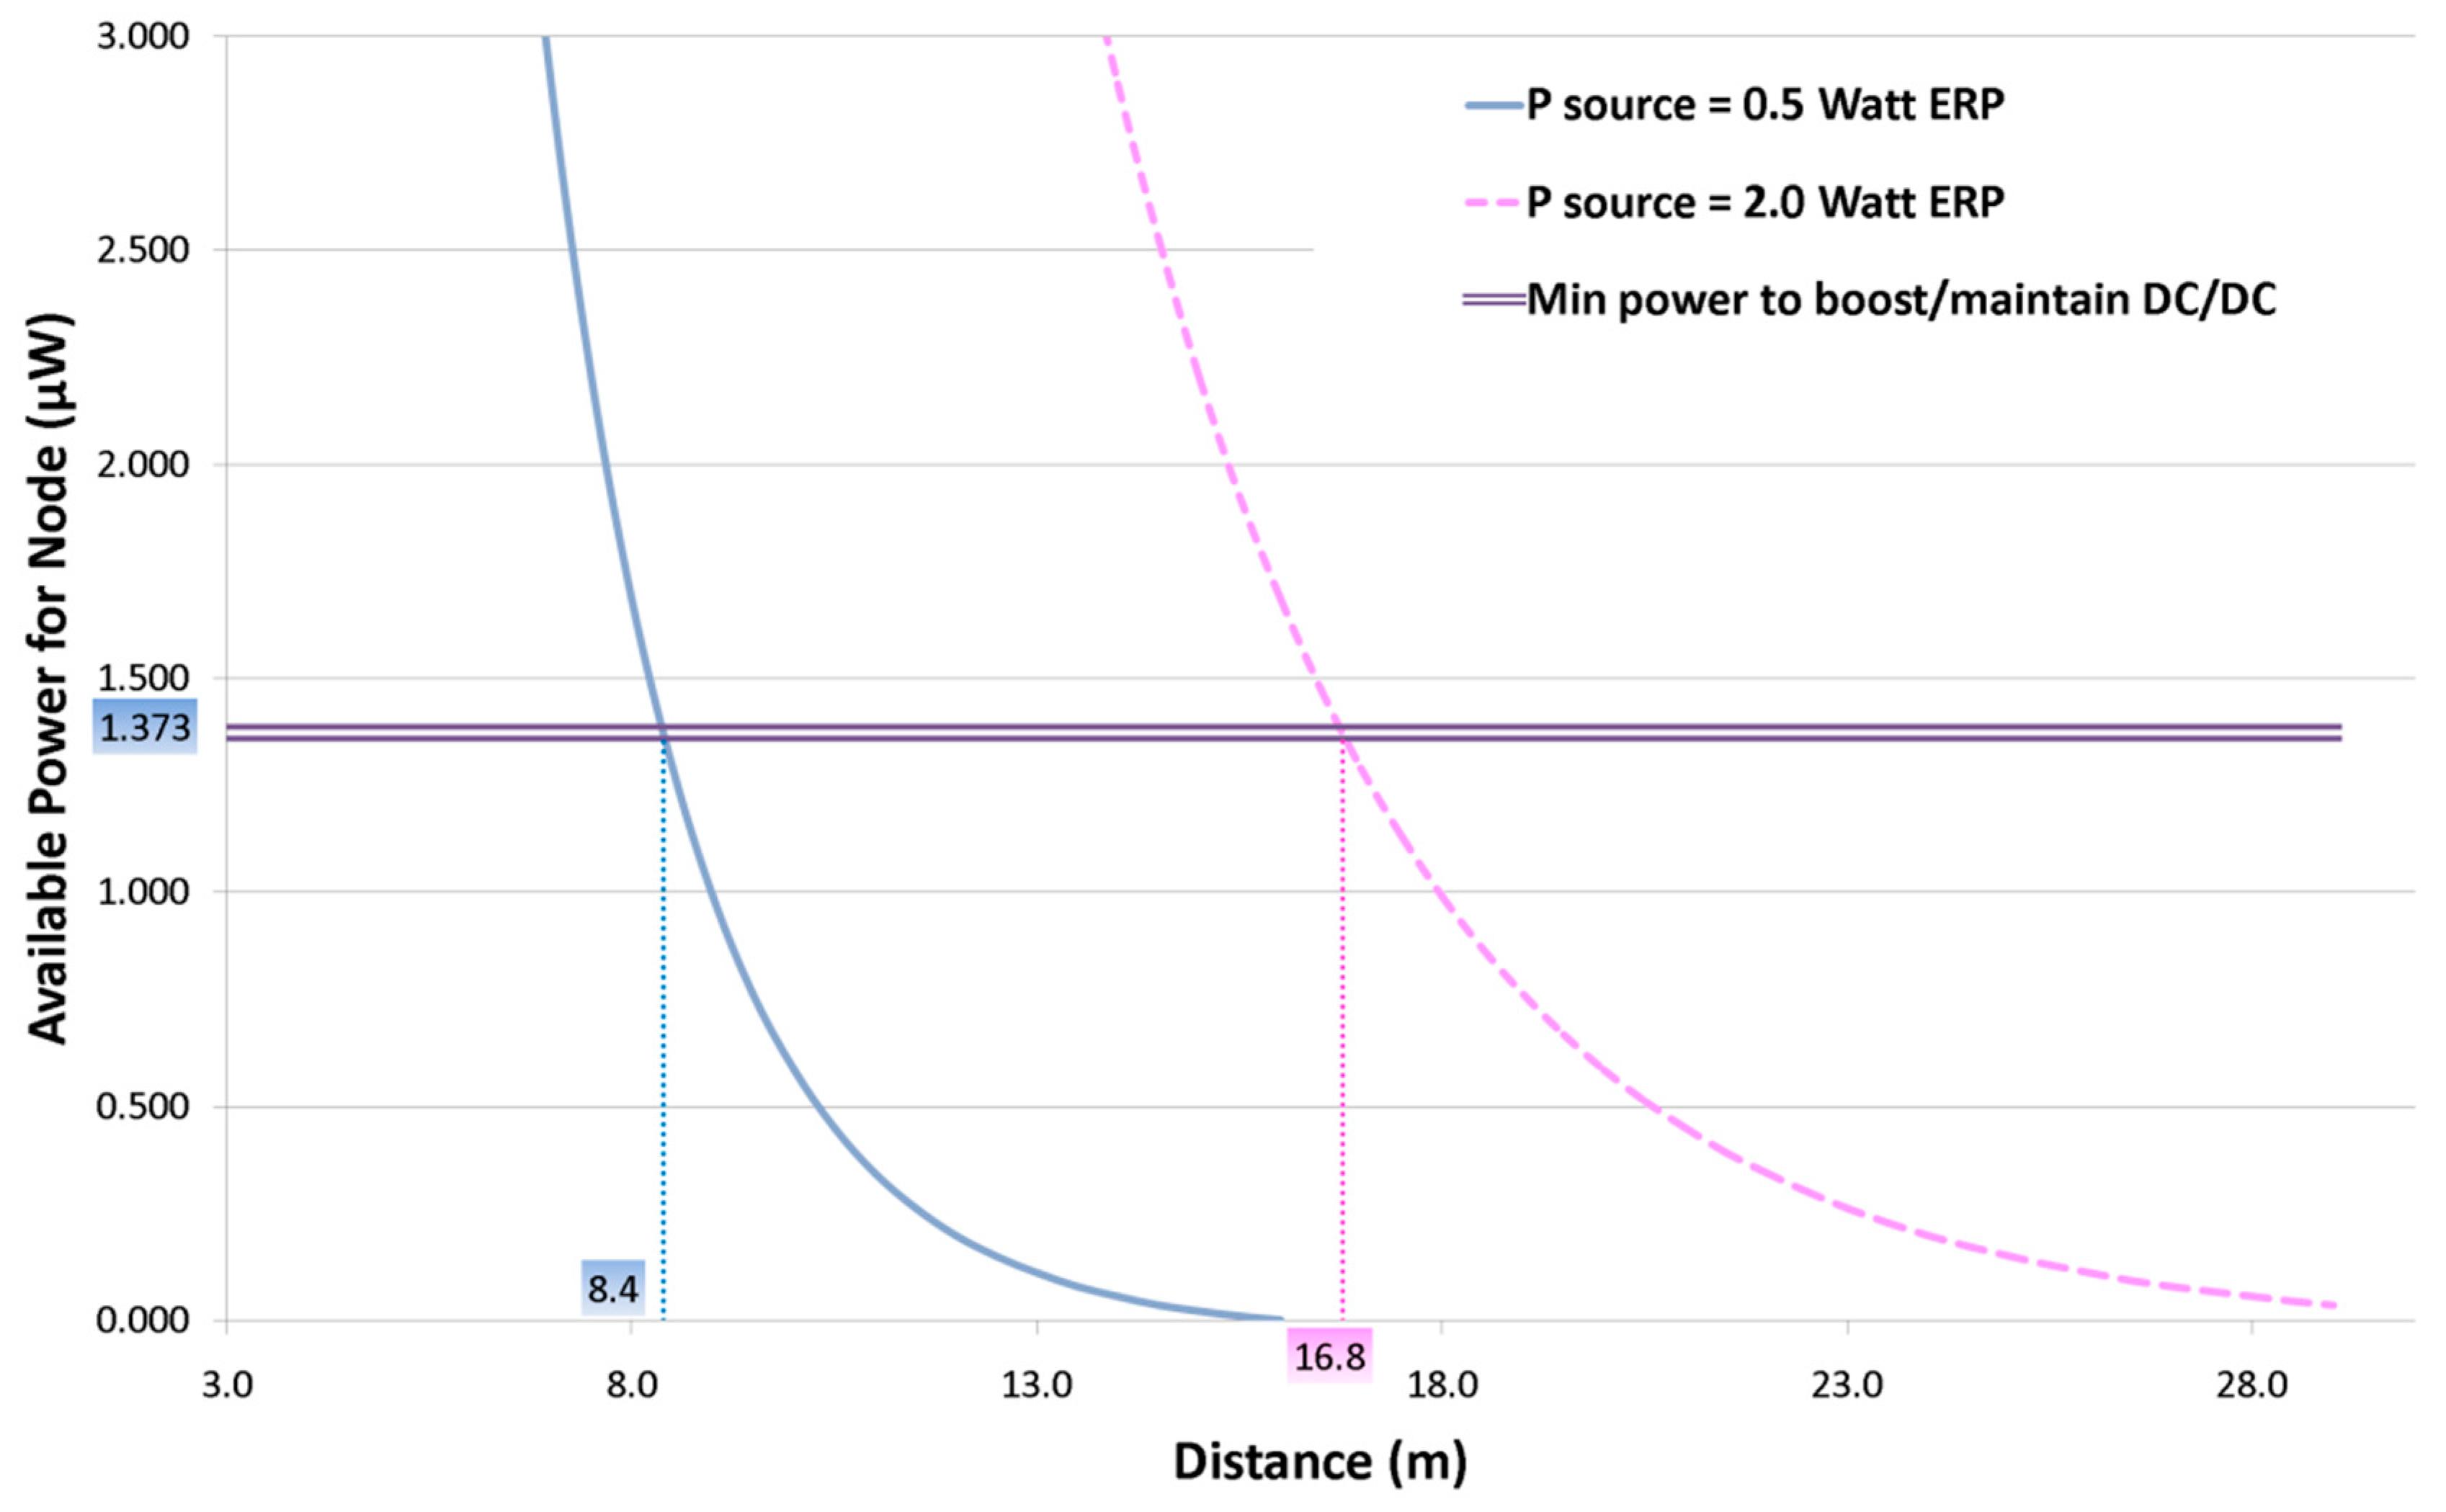 33 Simple Data Flow Diagram Visio For You , https